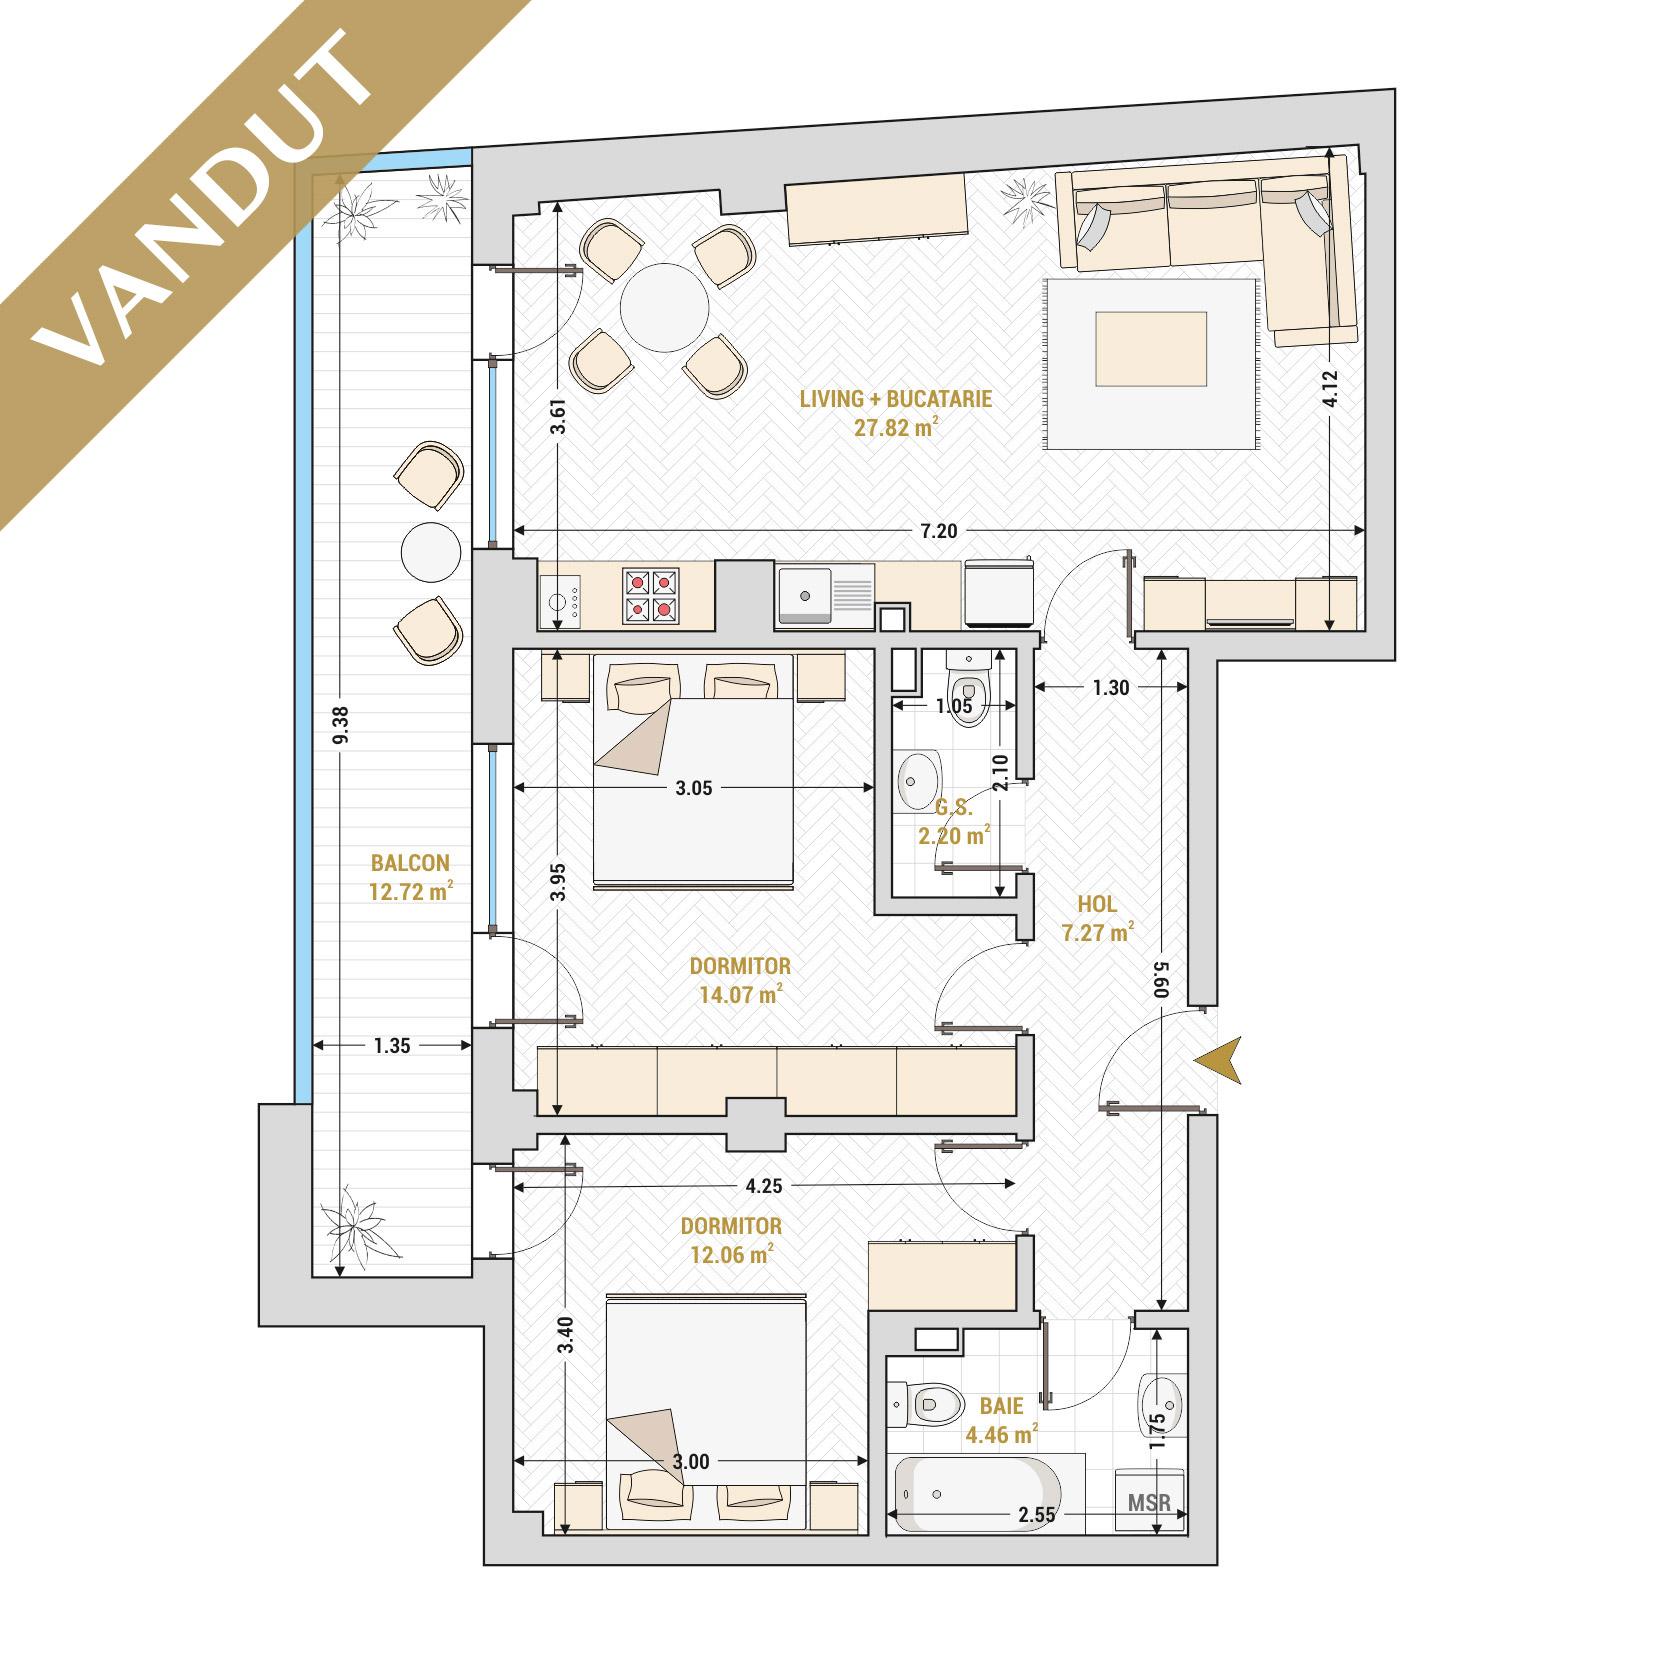 Apartament 3 camere de vanzare Bucuresti - Catedral Residence - Marriott, Piata Unirii, 13 Septembrie, Izvor - Tip 4 - T2 - V